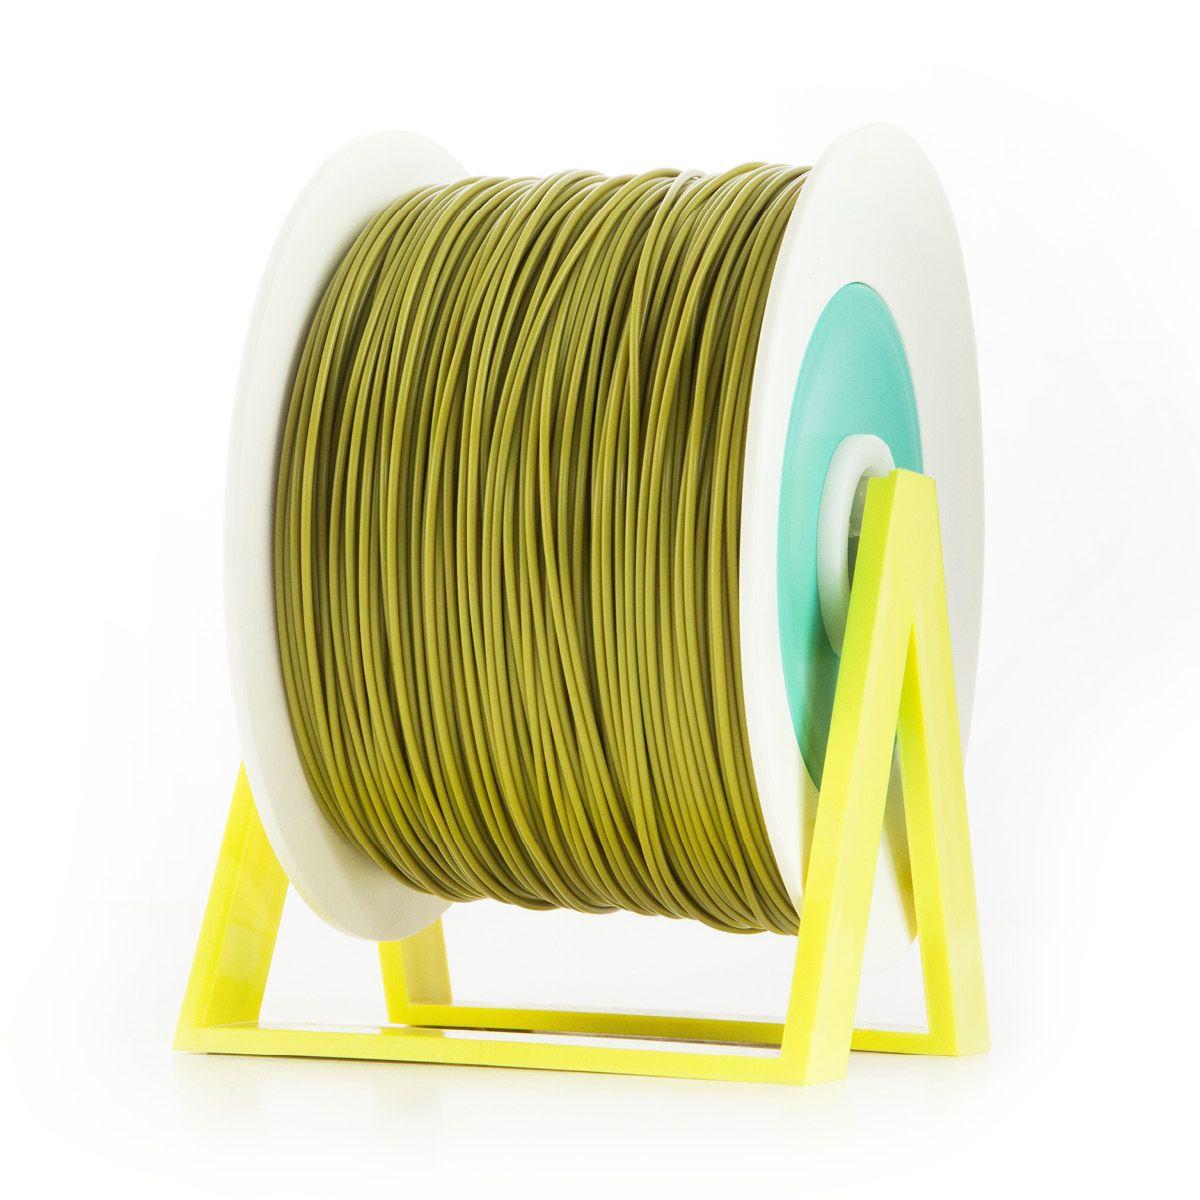 PLA Filament | Color: Olive Yellow